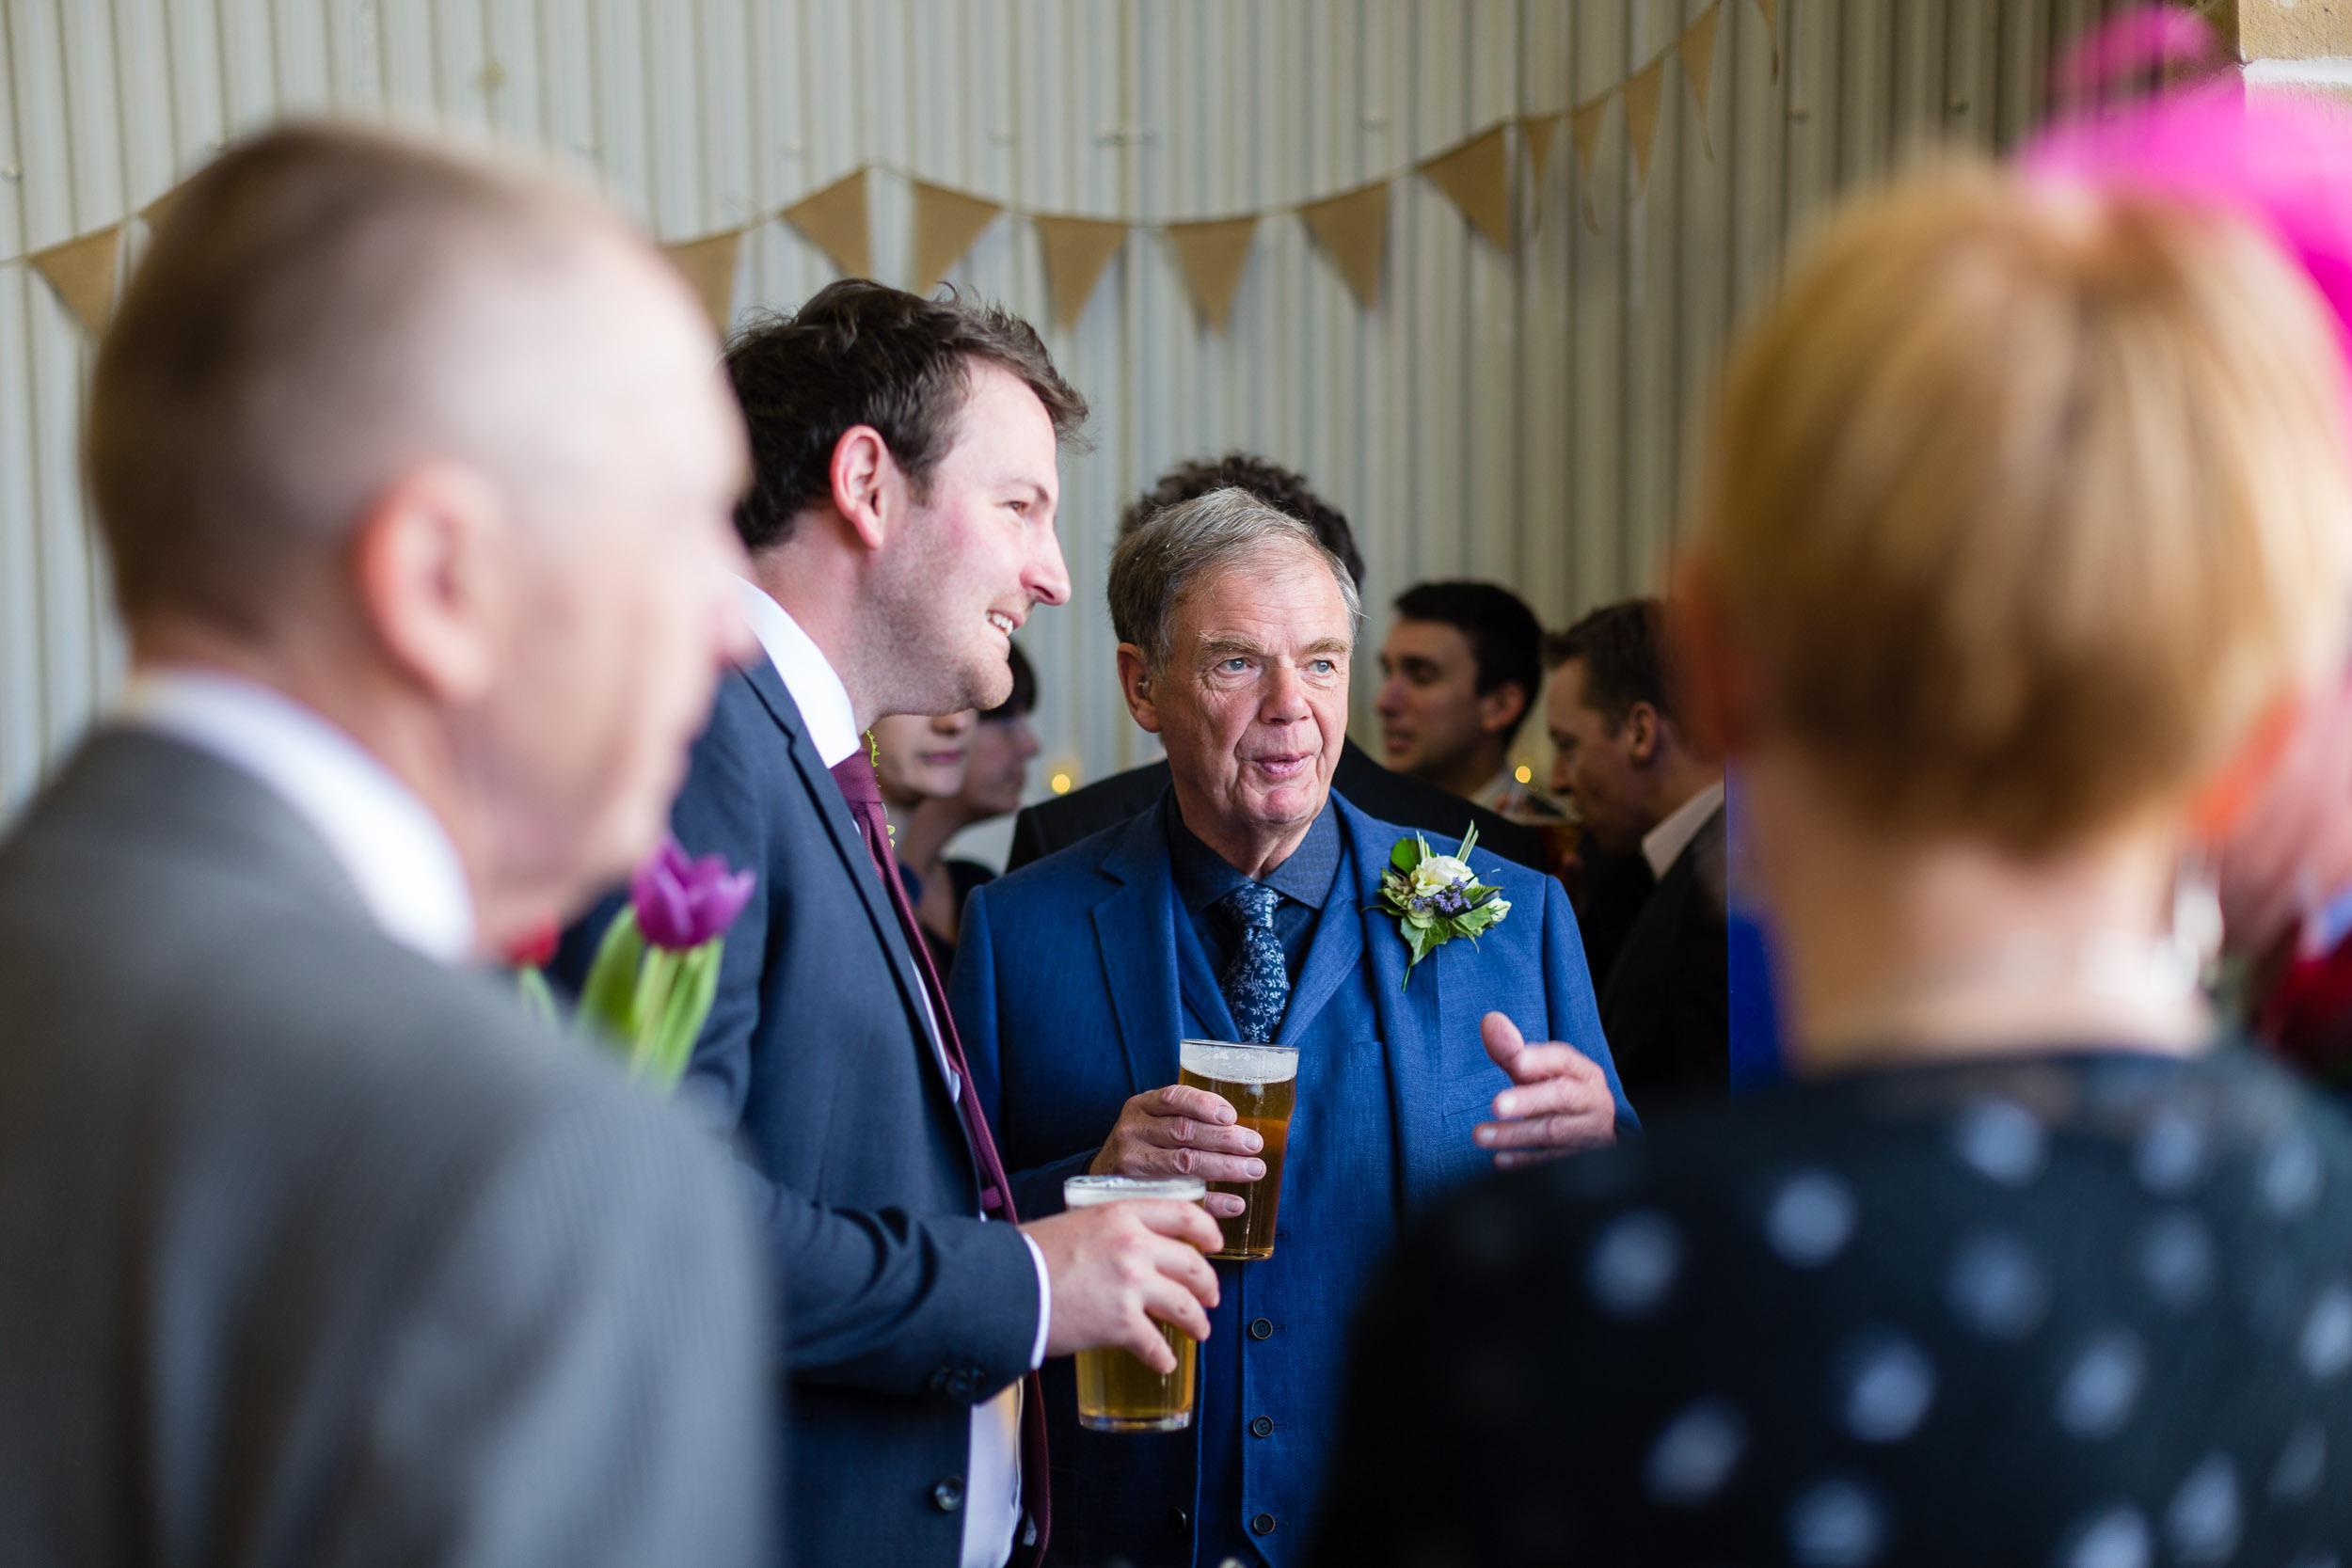 brockwell-lido-brixton-herne-hill-wedding-058.jpg